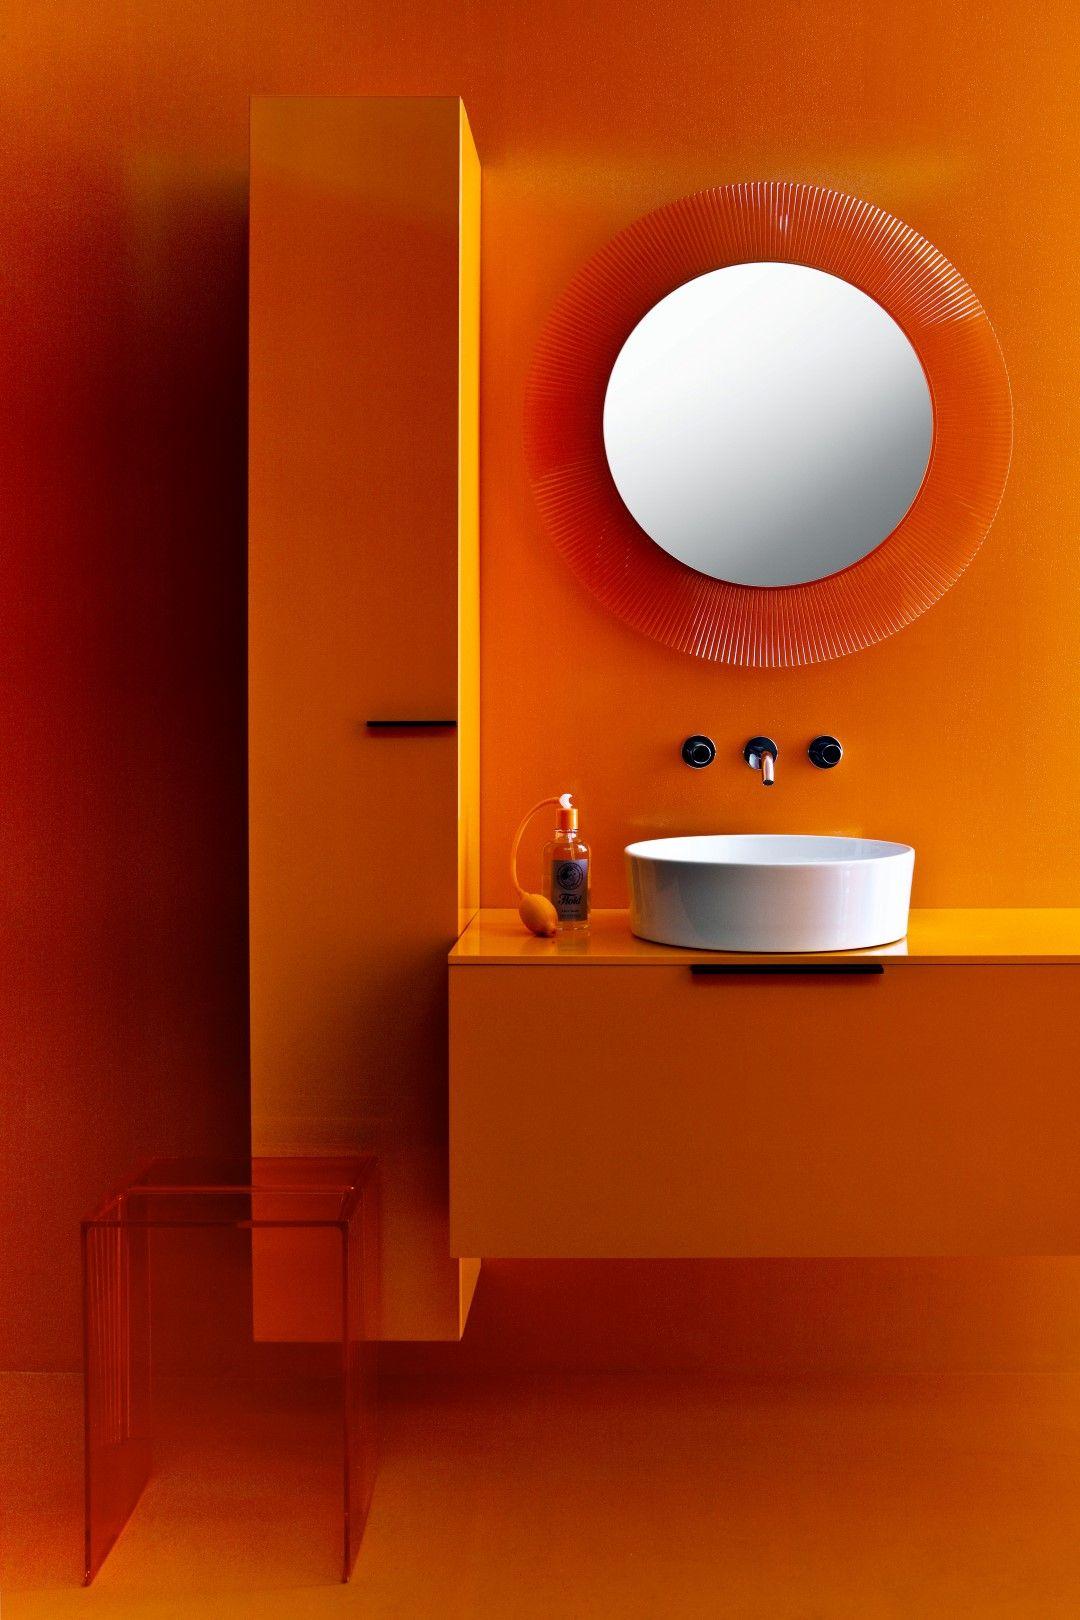 Orange   Arancio   Oranje   オレンジ   Colour   Texture   Style ...